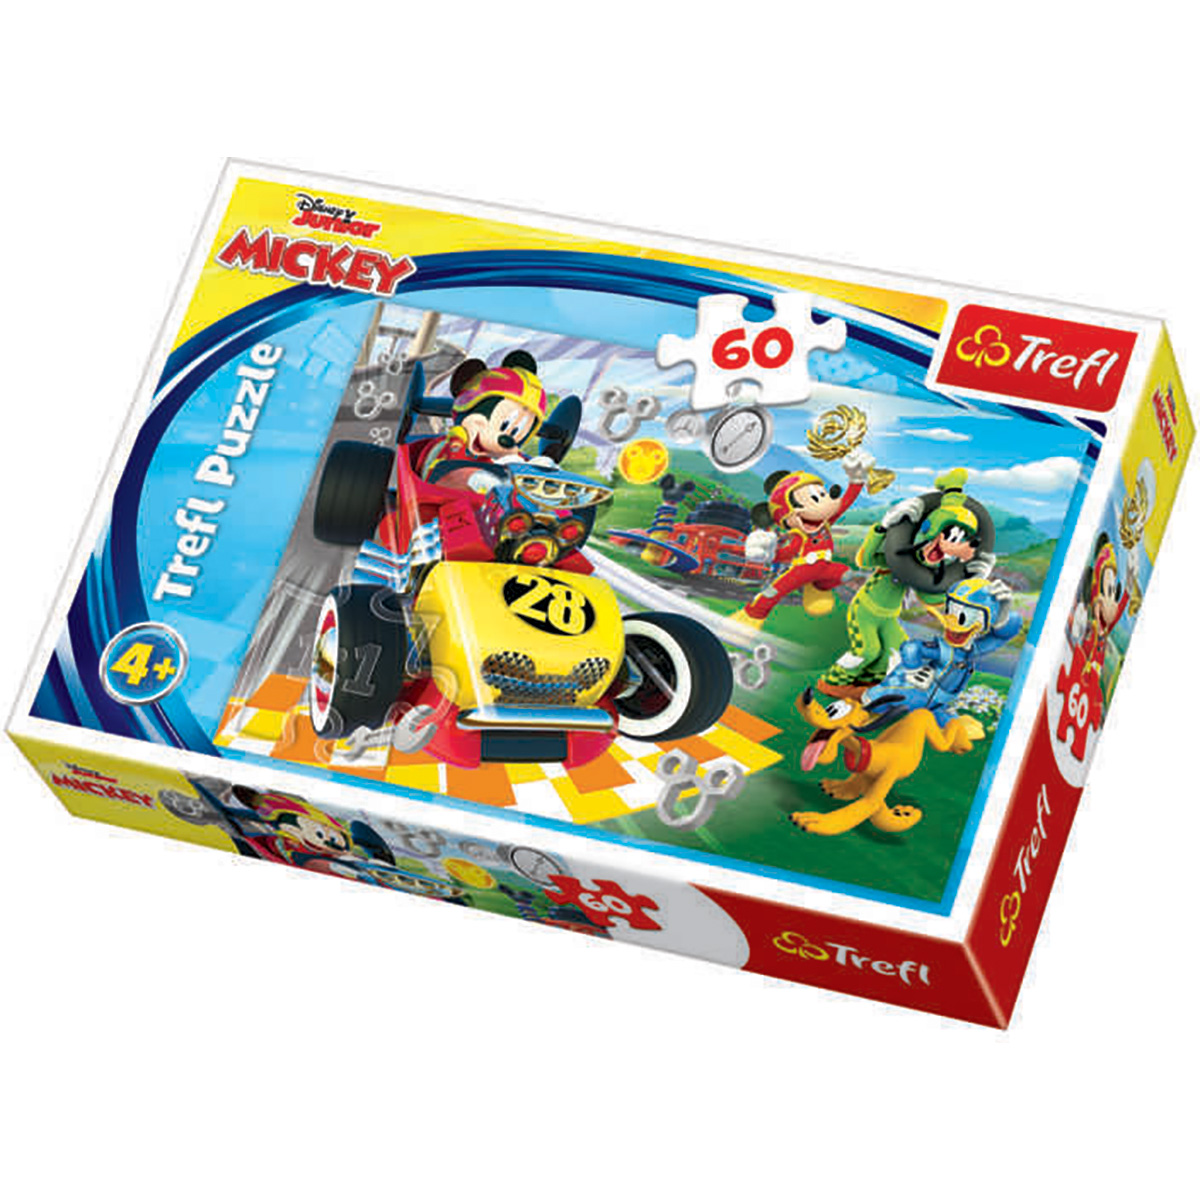 Puzzle Trefl, Mickey Mouse, Raliu cu prietenii, 60 piese